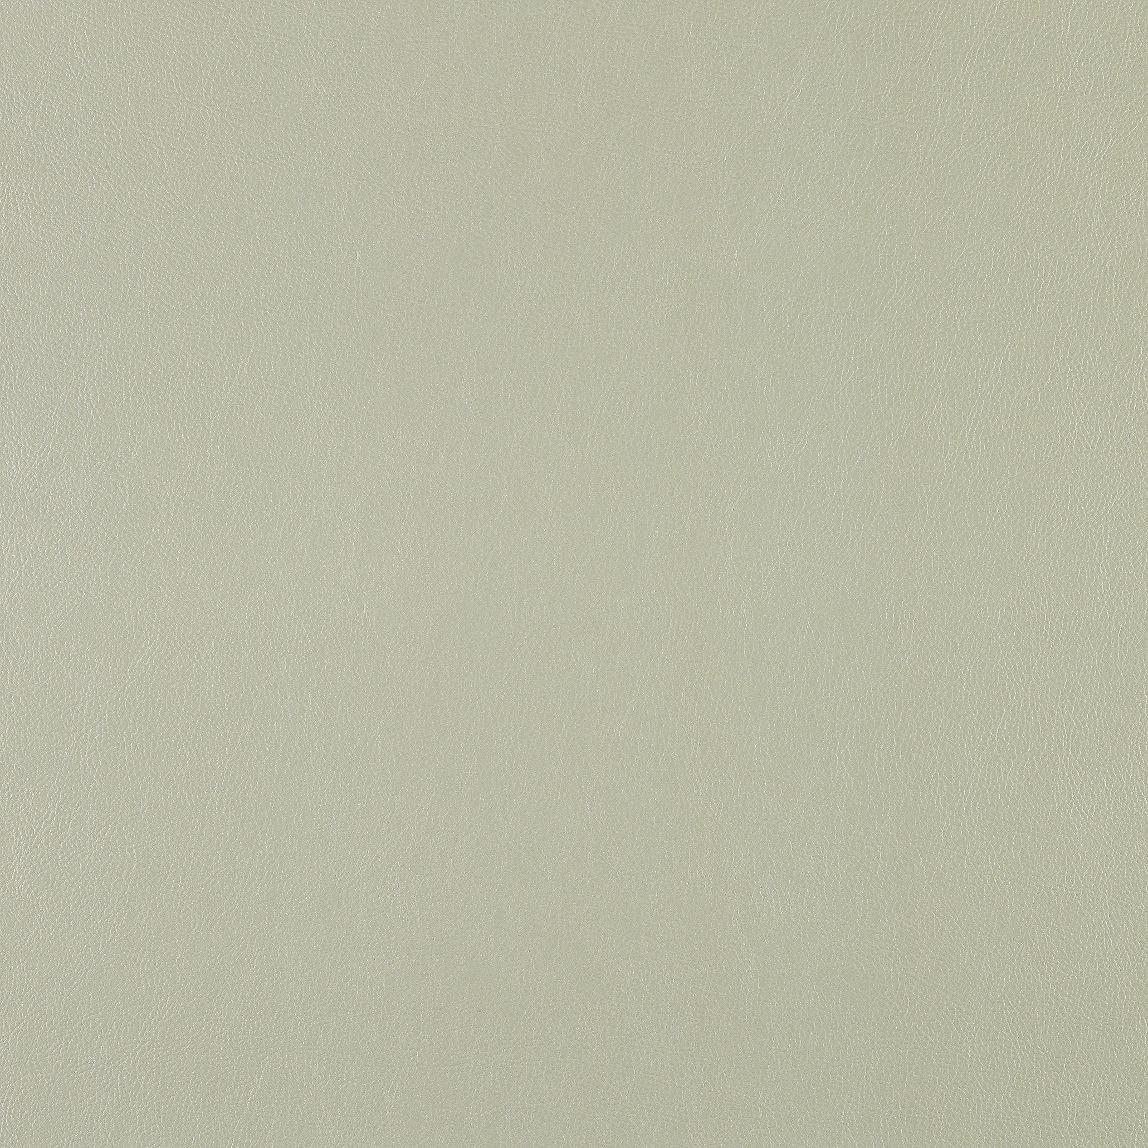 Lariat Celadon Swatch